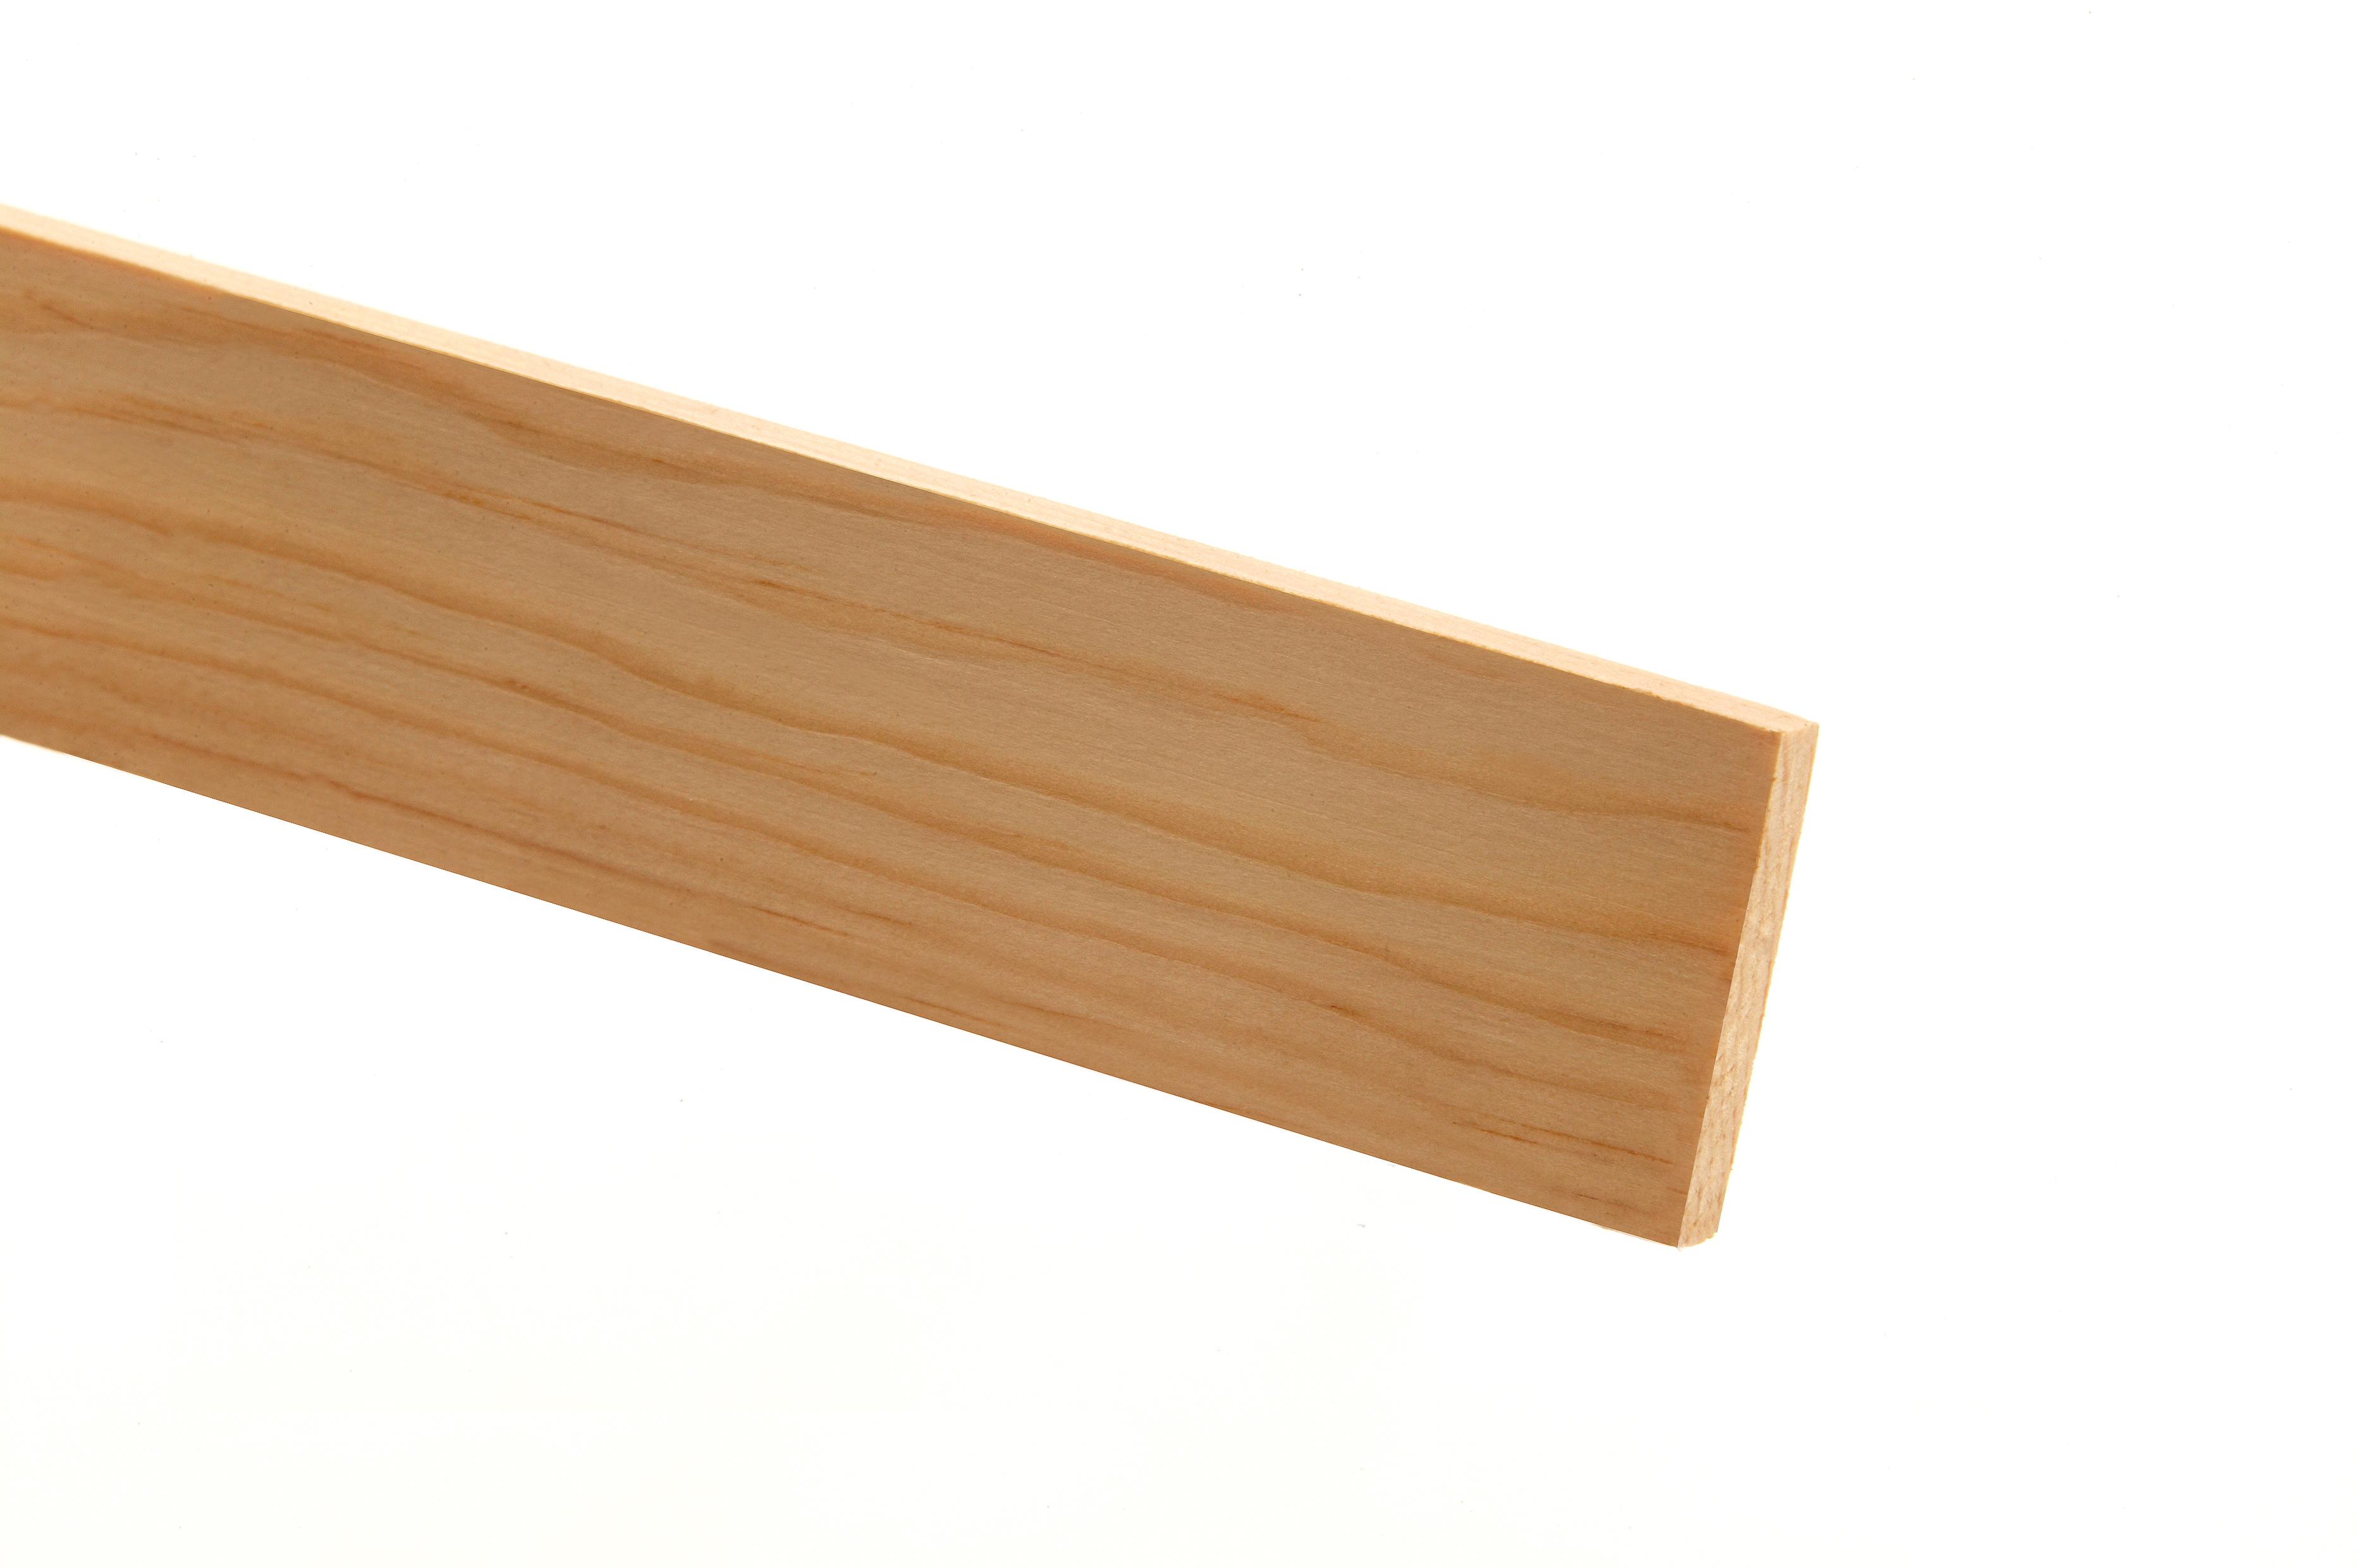 10 Pine PSE Stripwood 21 x 44.5 x 2400mm